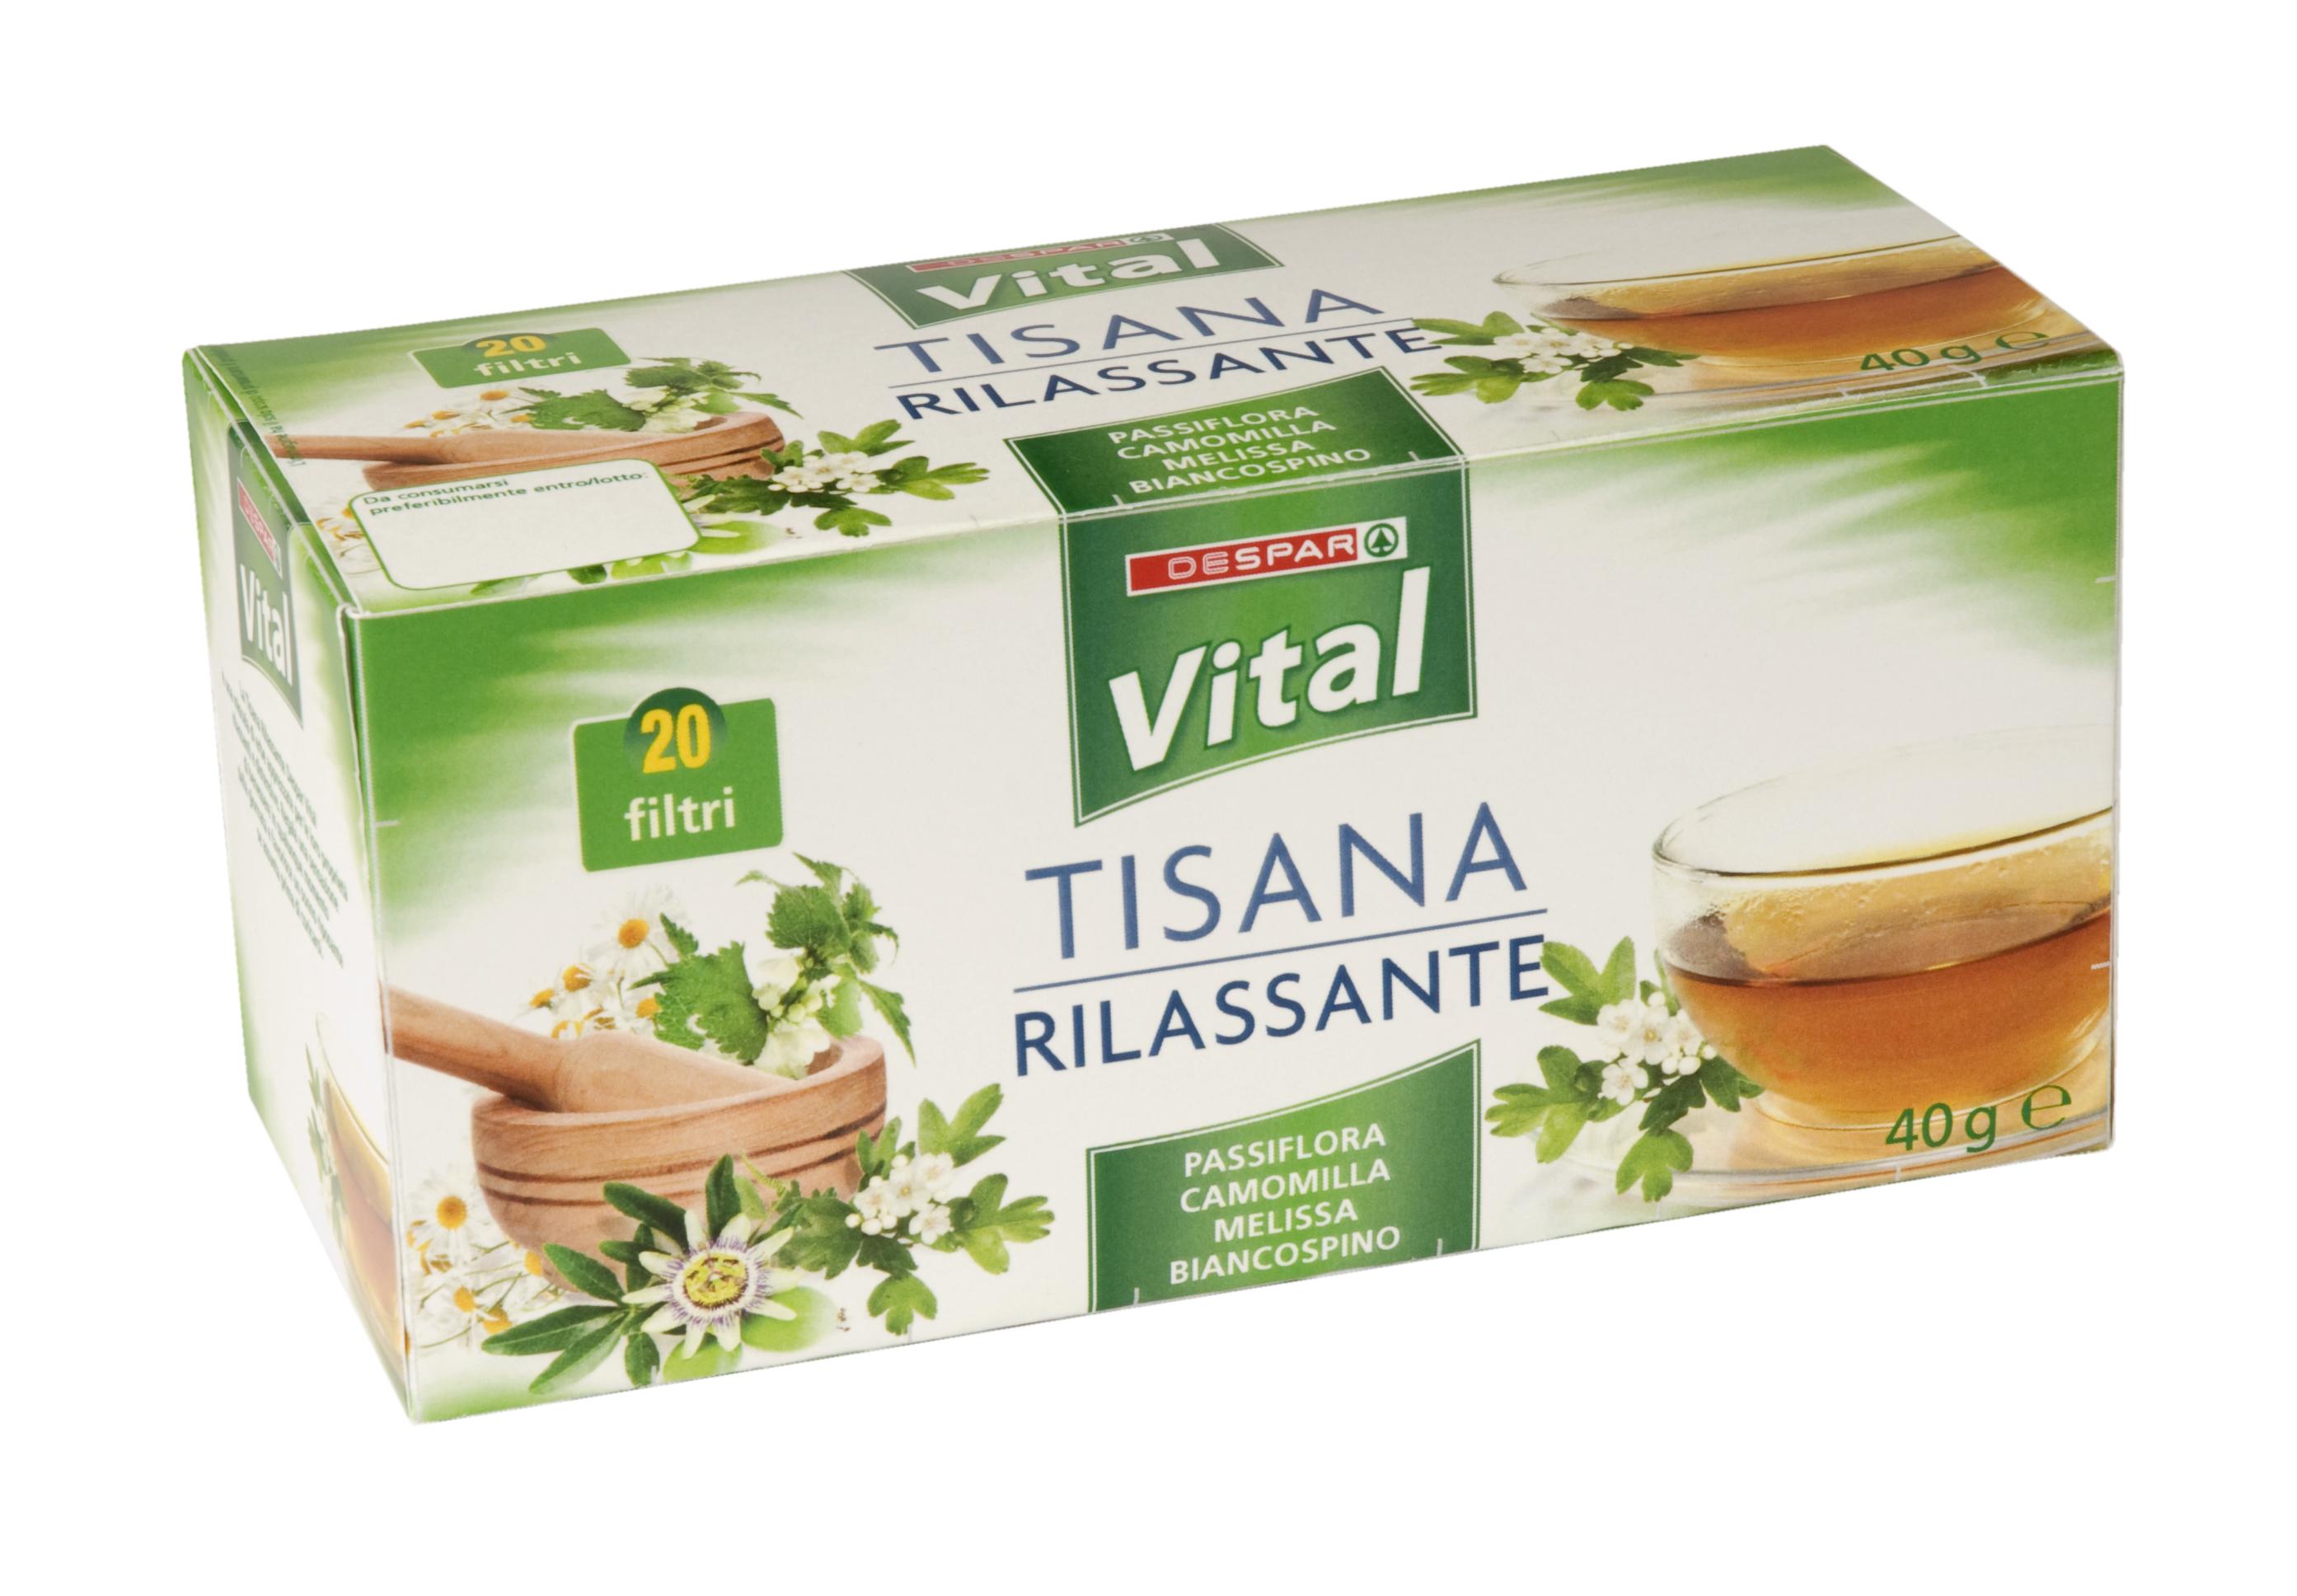 TISANA  RILASSANTE 20F  VITAL  40g